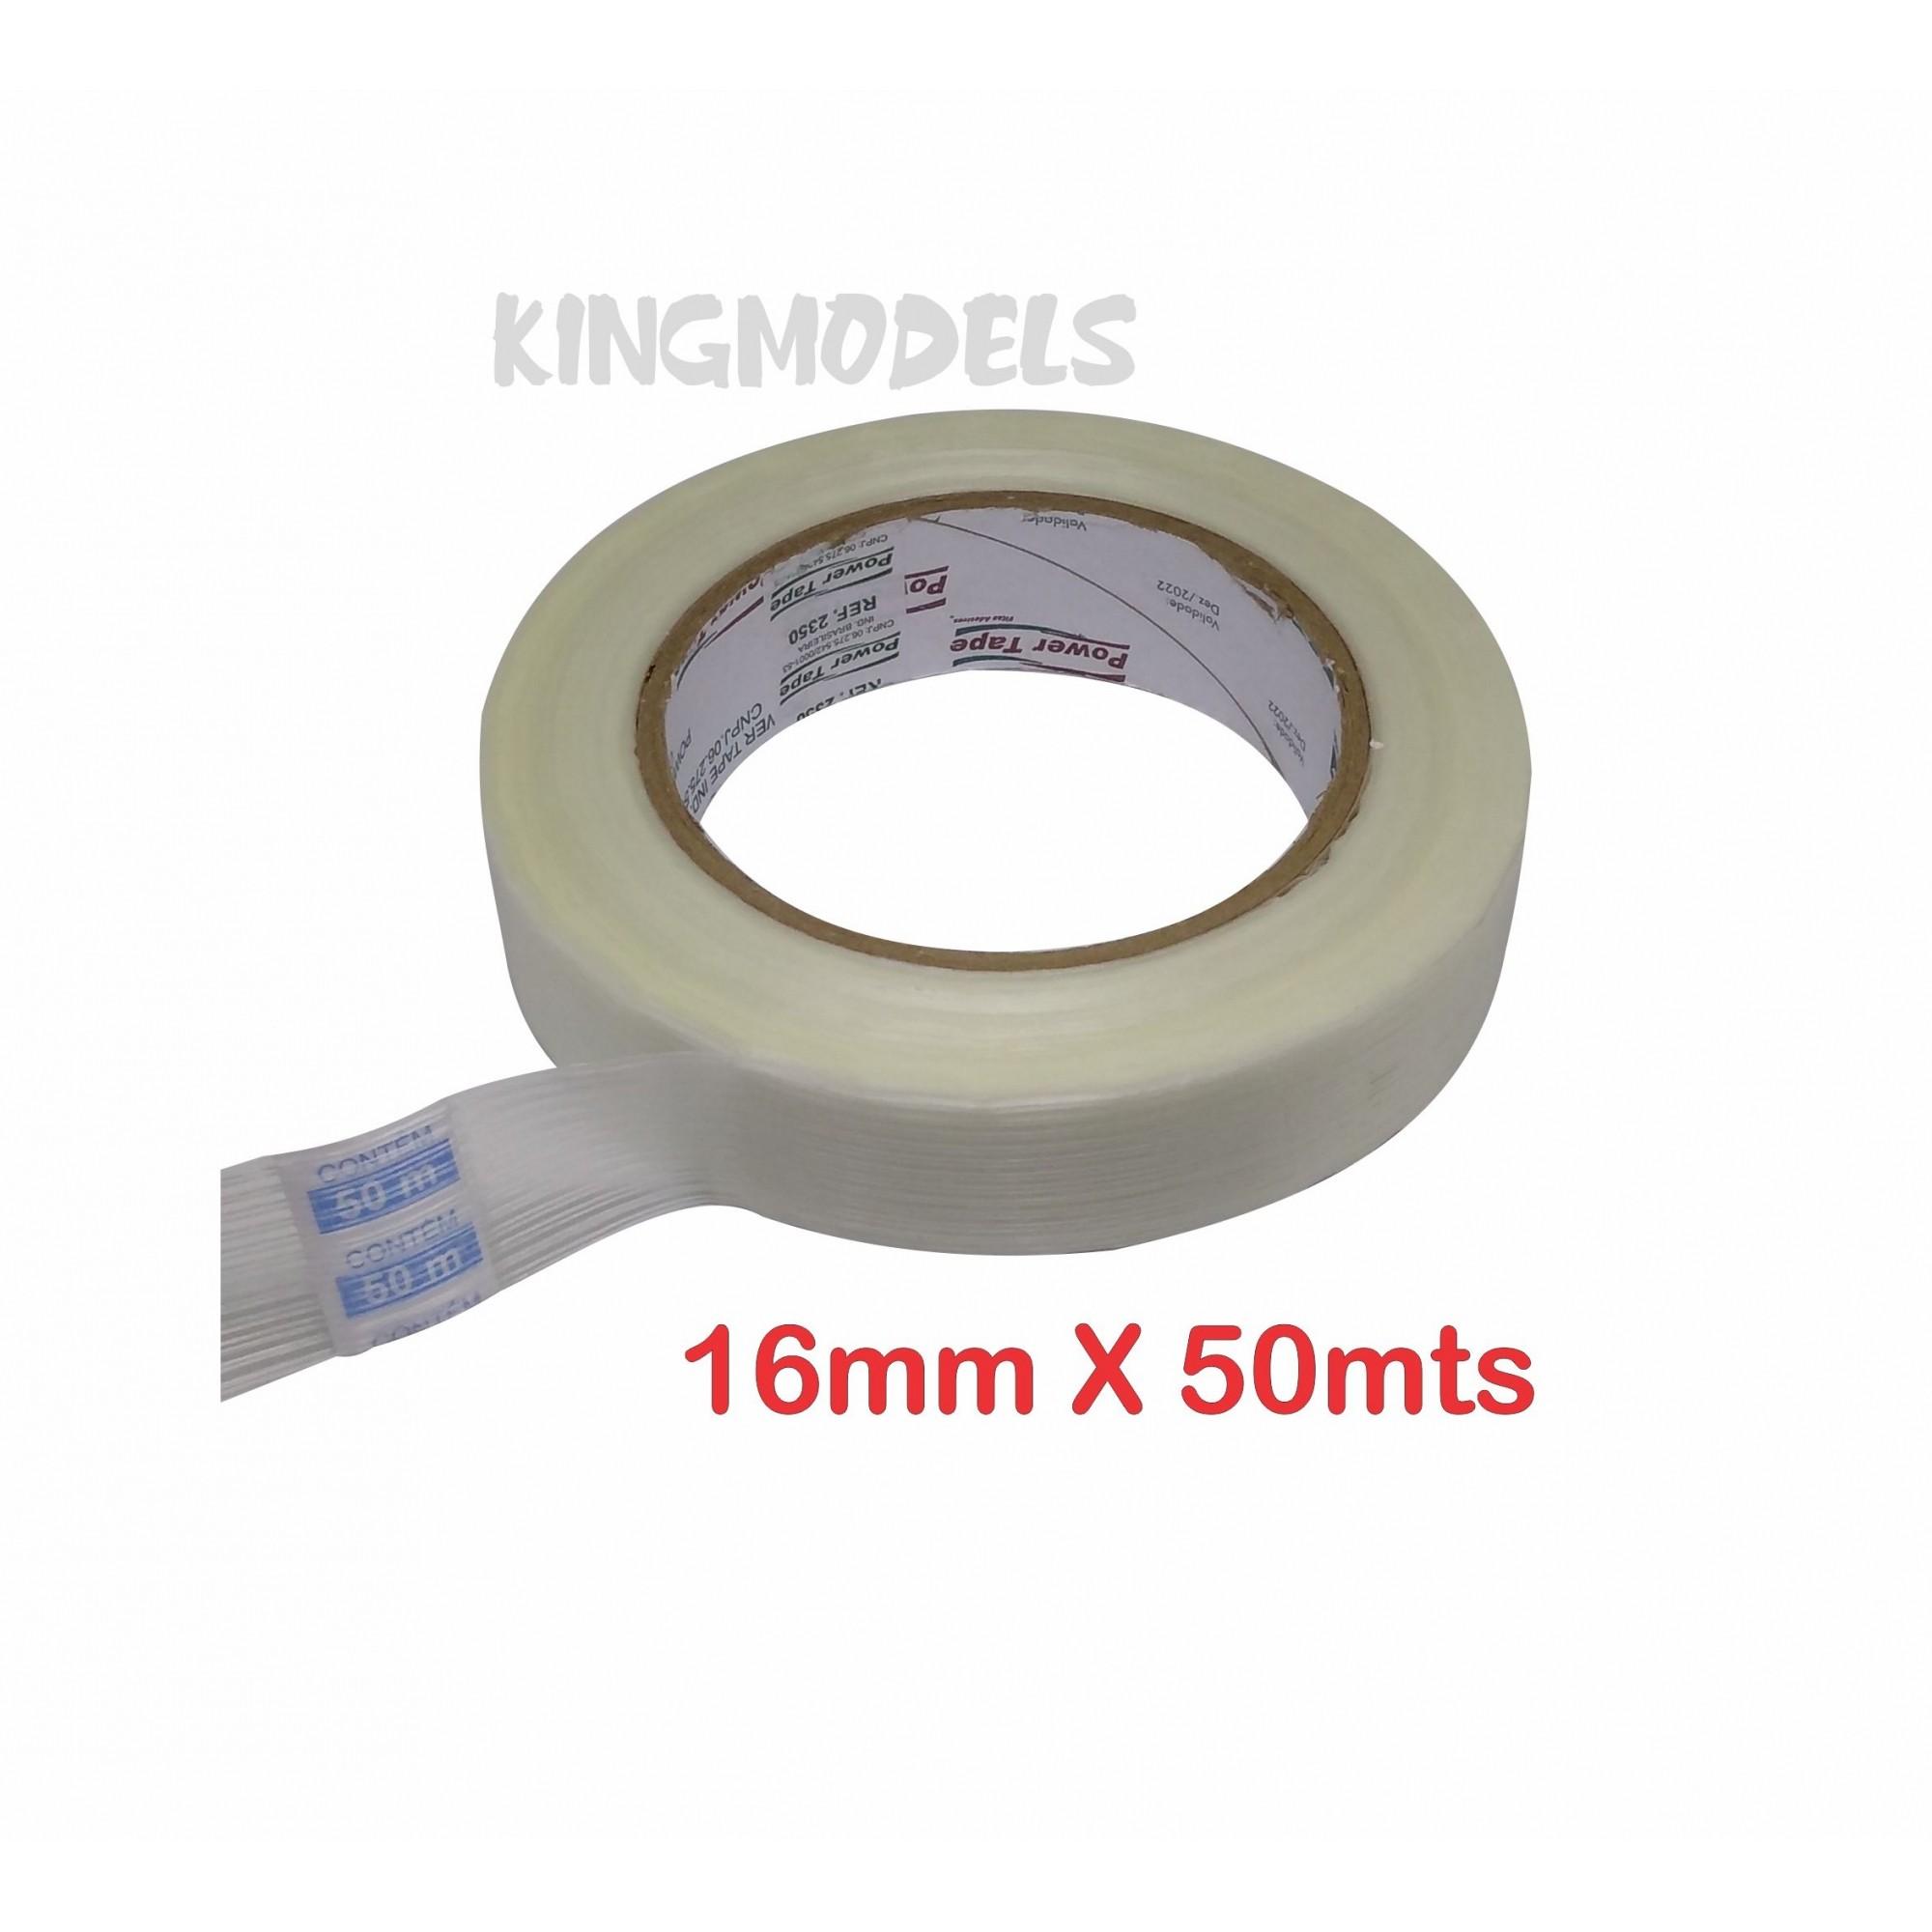 Fita Filamentosa Em Pp - 16mm X 50mts - Reforço Aeromodelo  - King Models